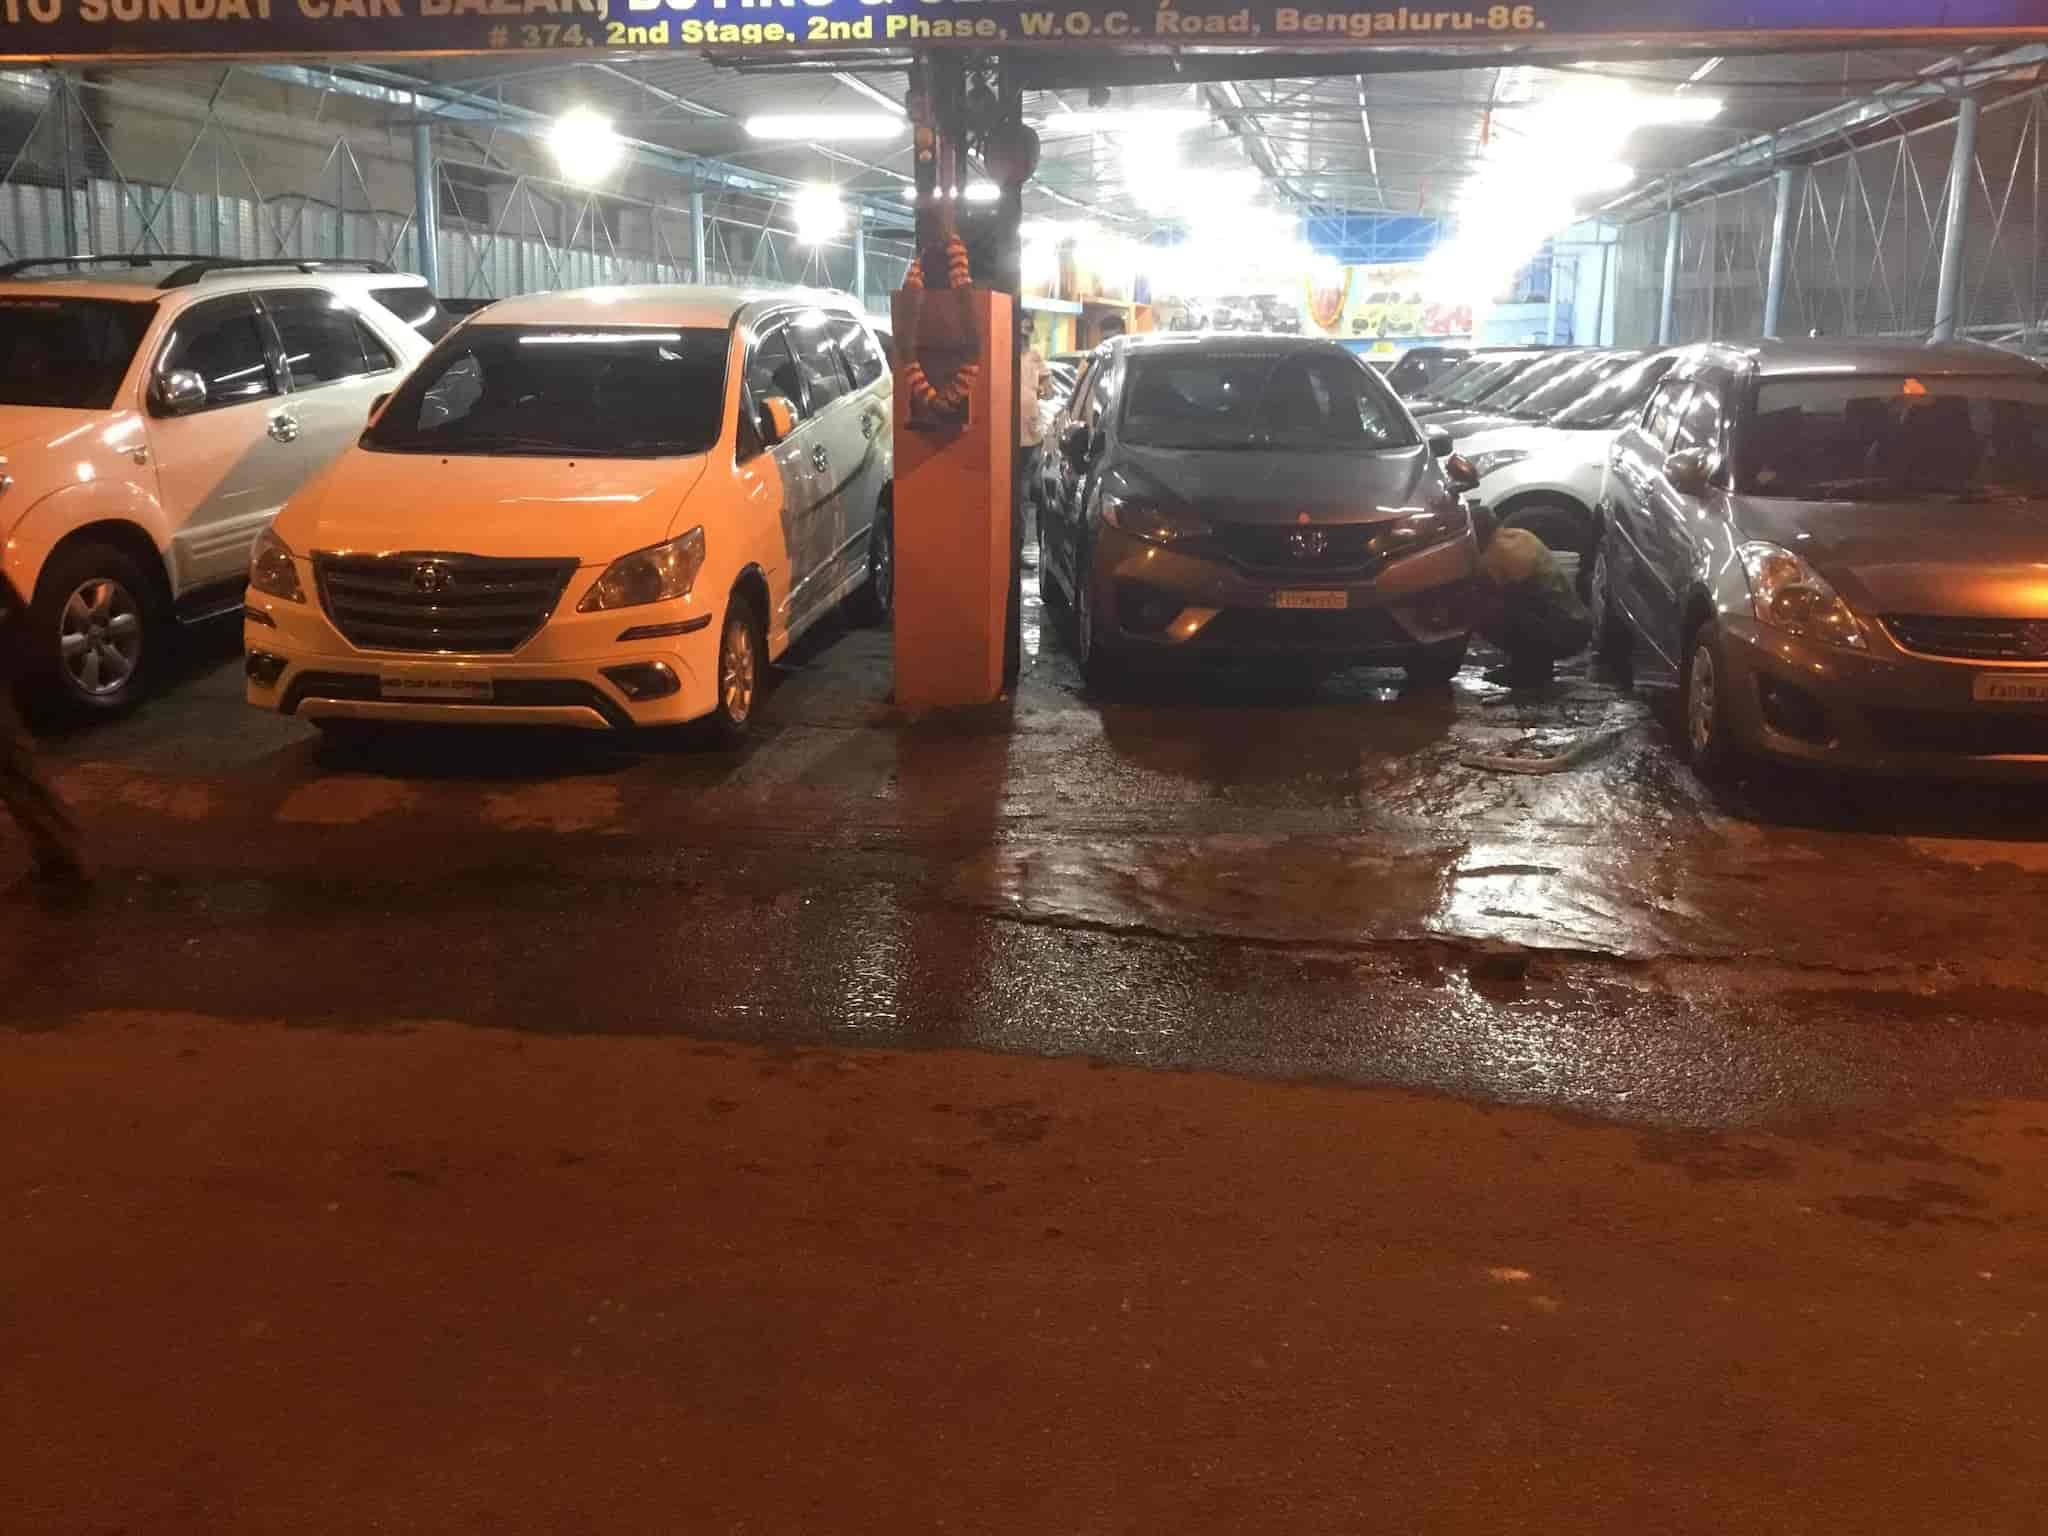 Sagar Auto Consultants Photos, Mahalakshmipuram Layout, Bangalore ...